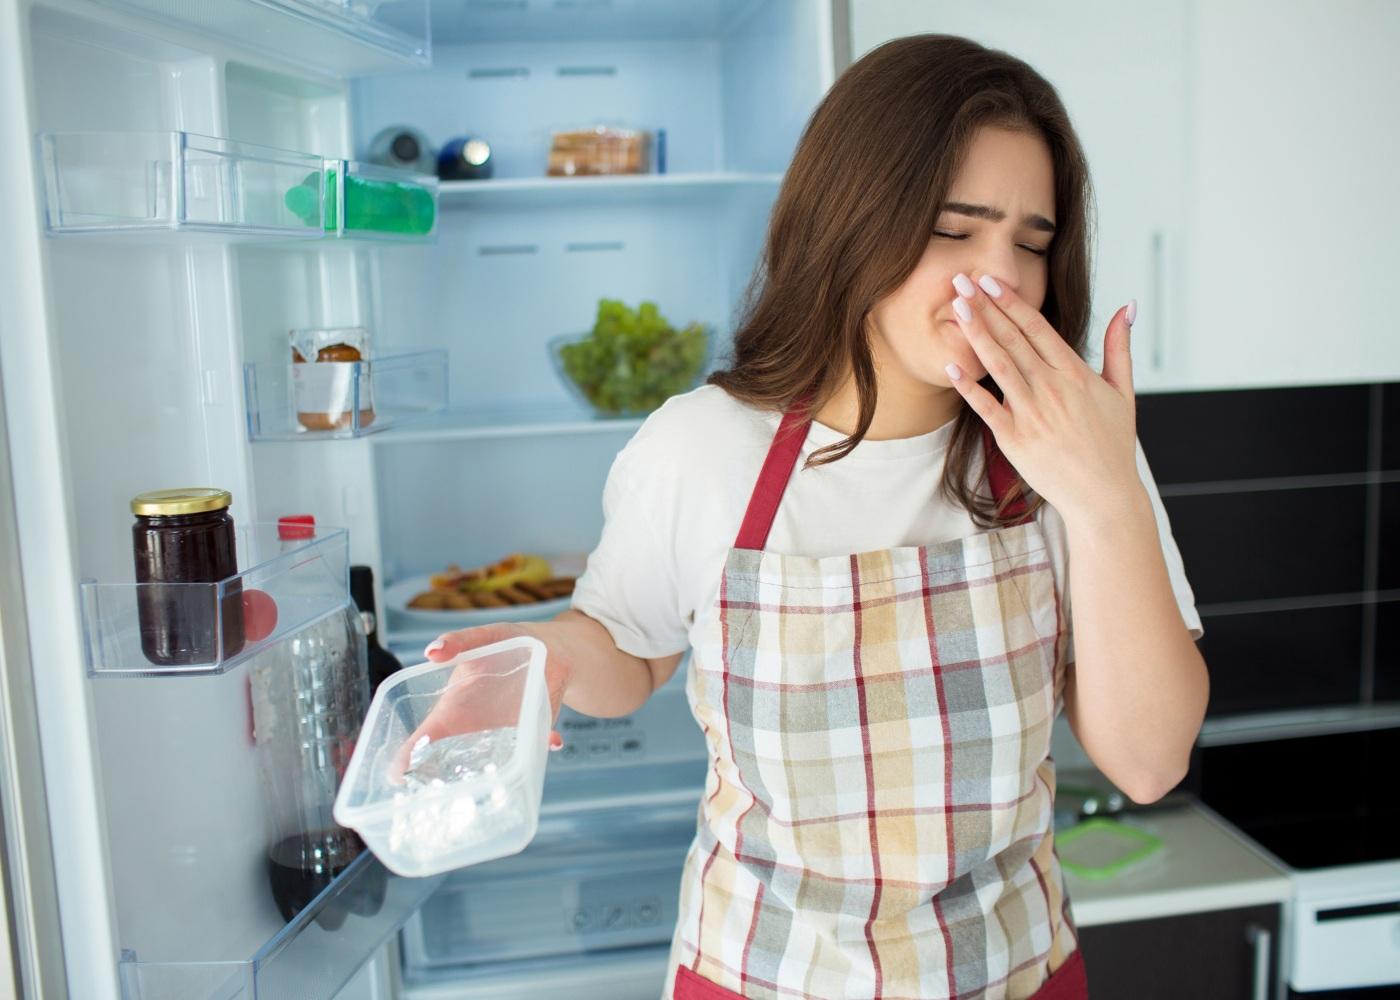 frigorífico mau cheiro